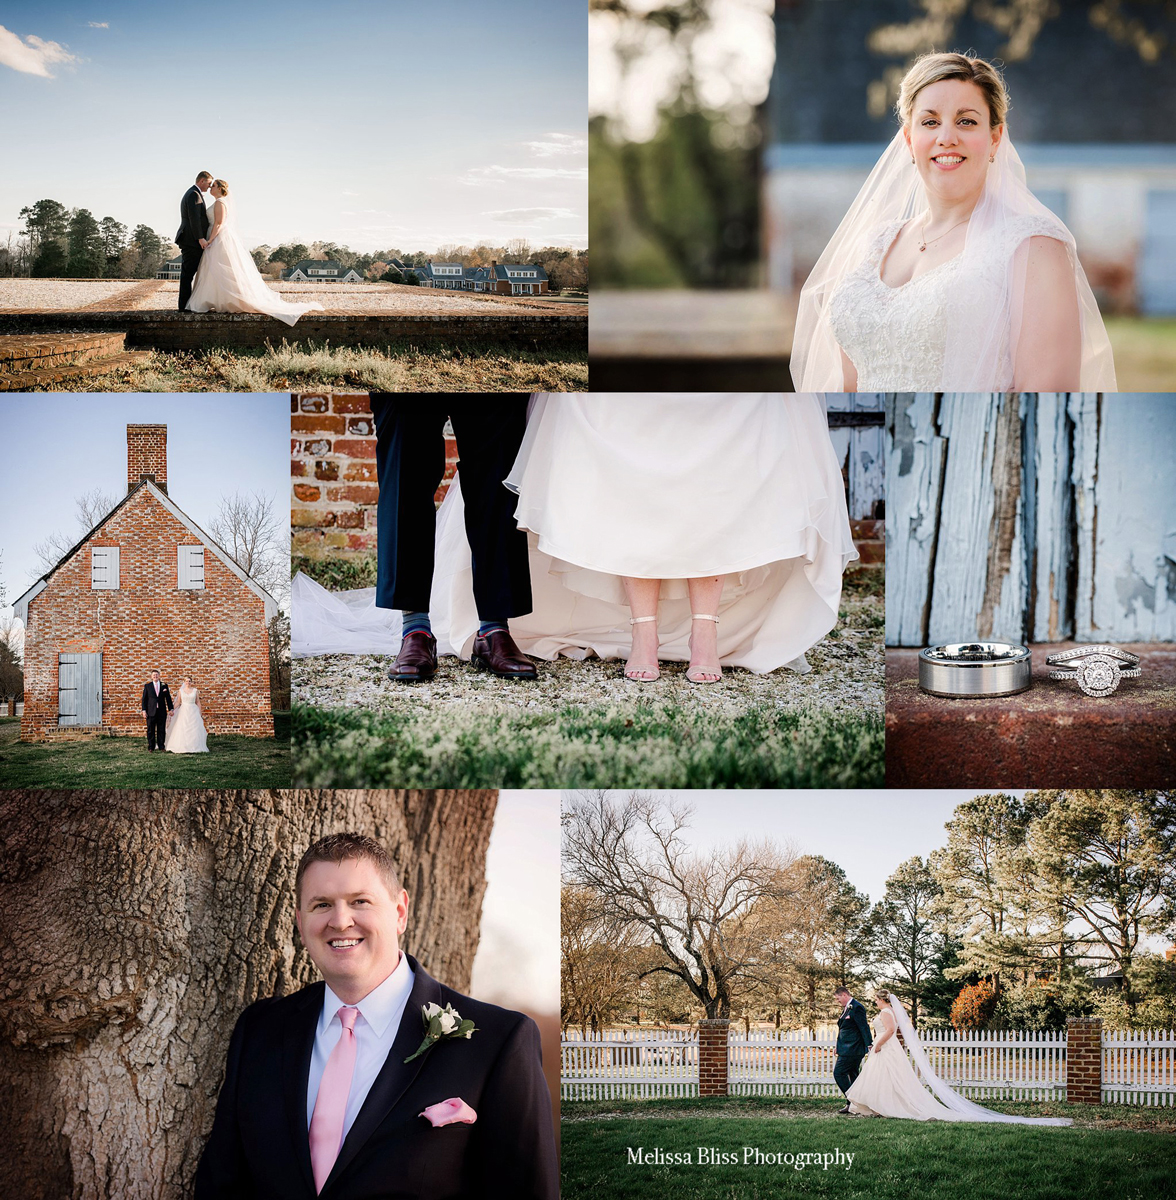 williamsburg-wedding-photographer-melissa-bliss-photography-bride-and-groom-portraits-kingsmills-hampton-roads-photographers.jpg